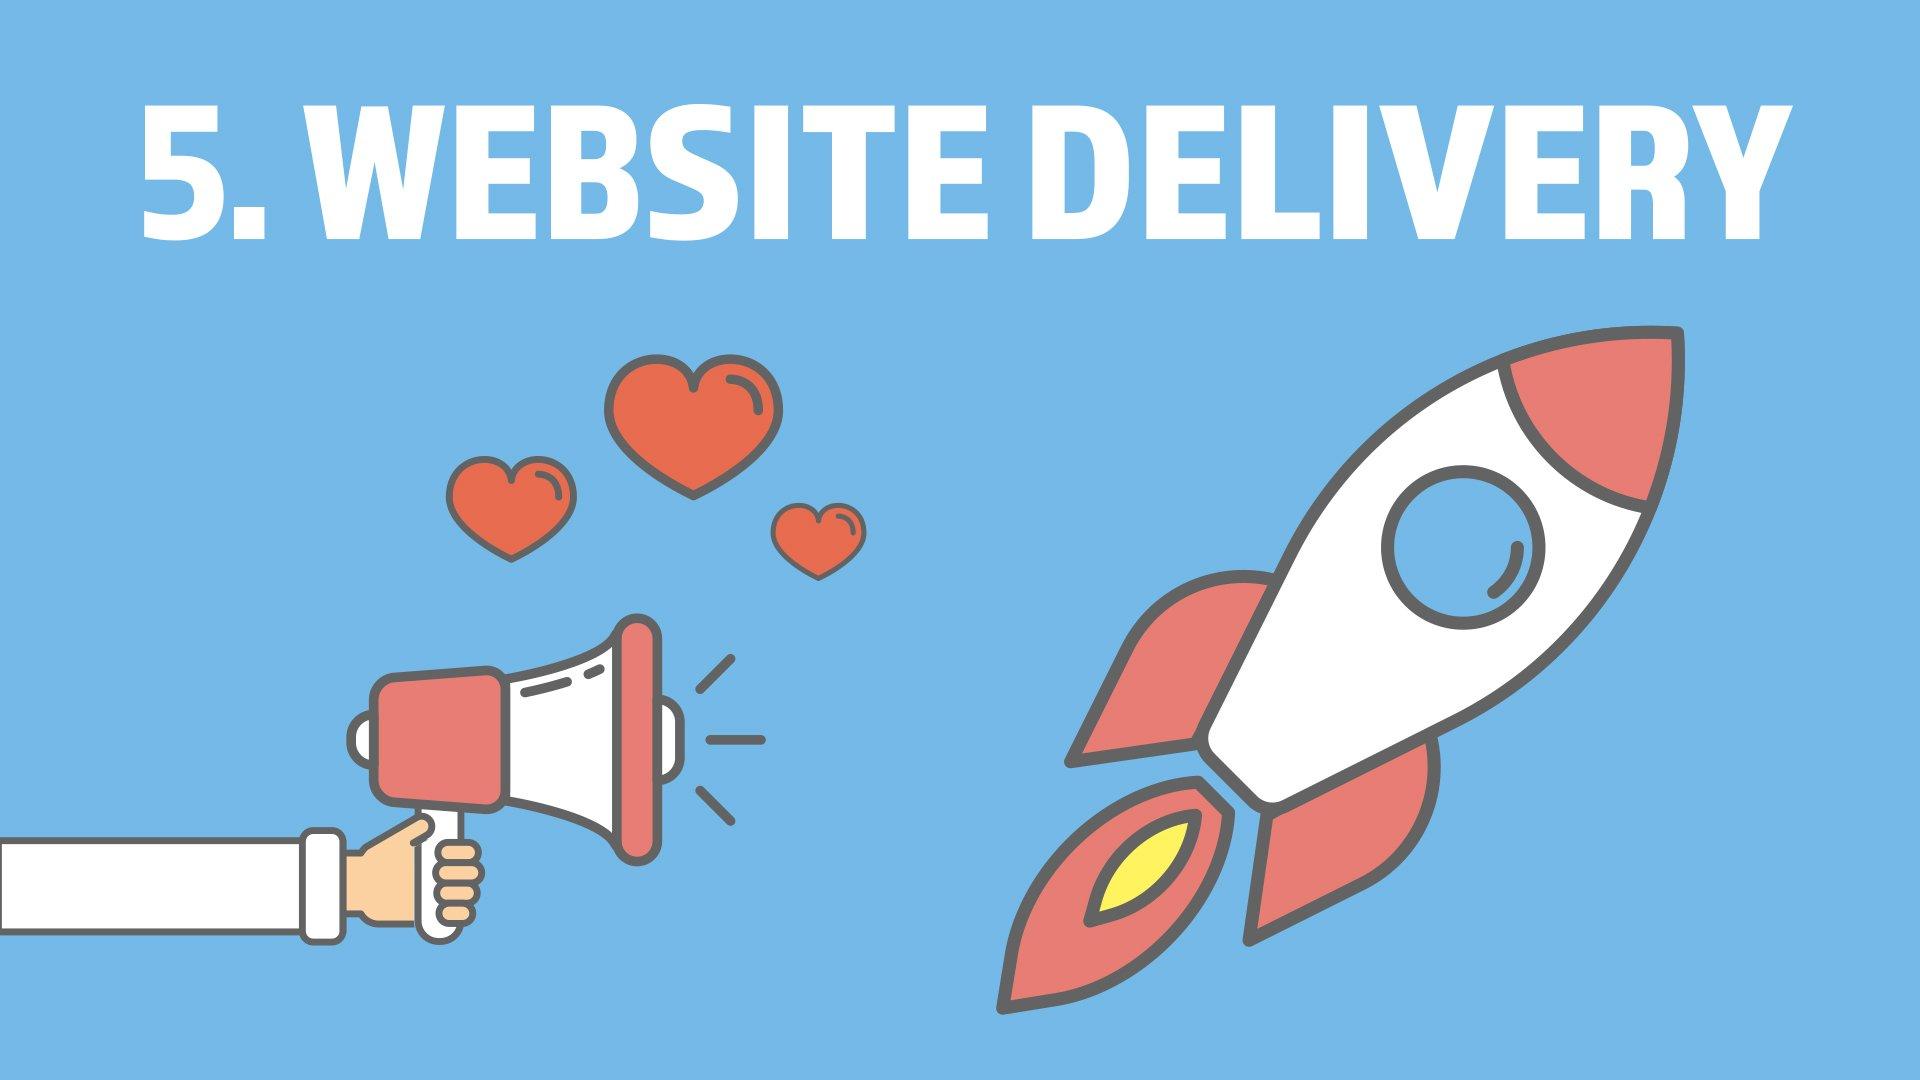 5. Website Delivery